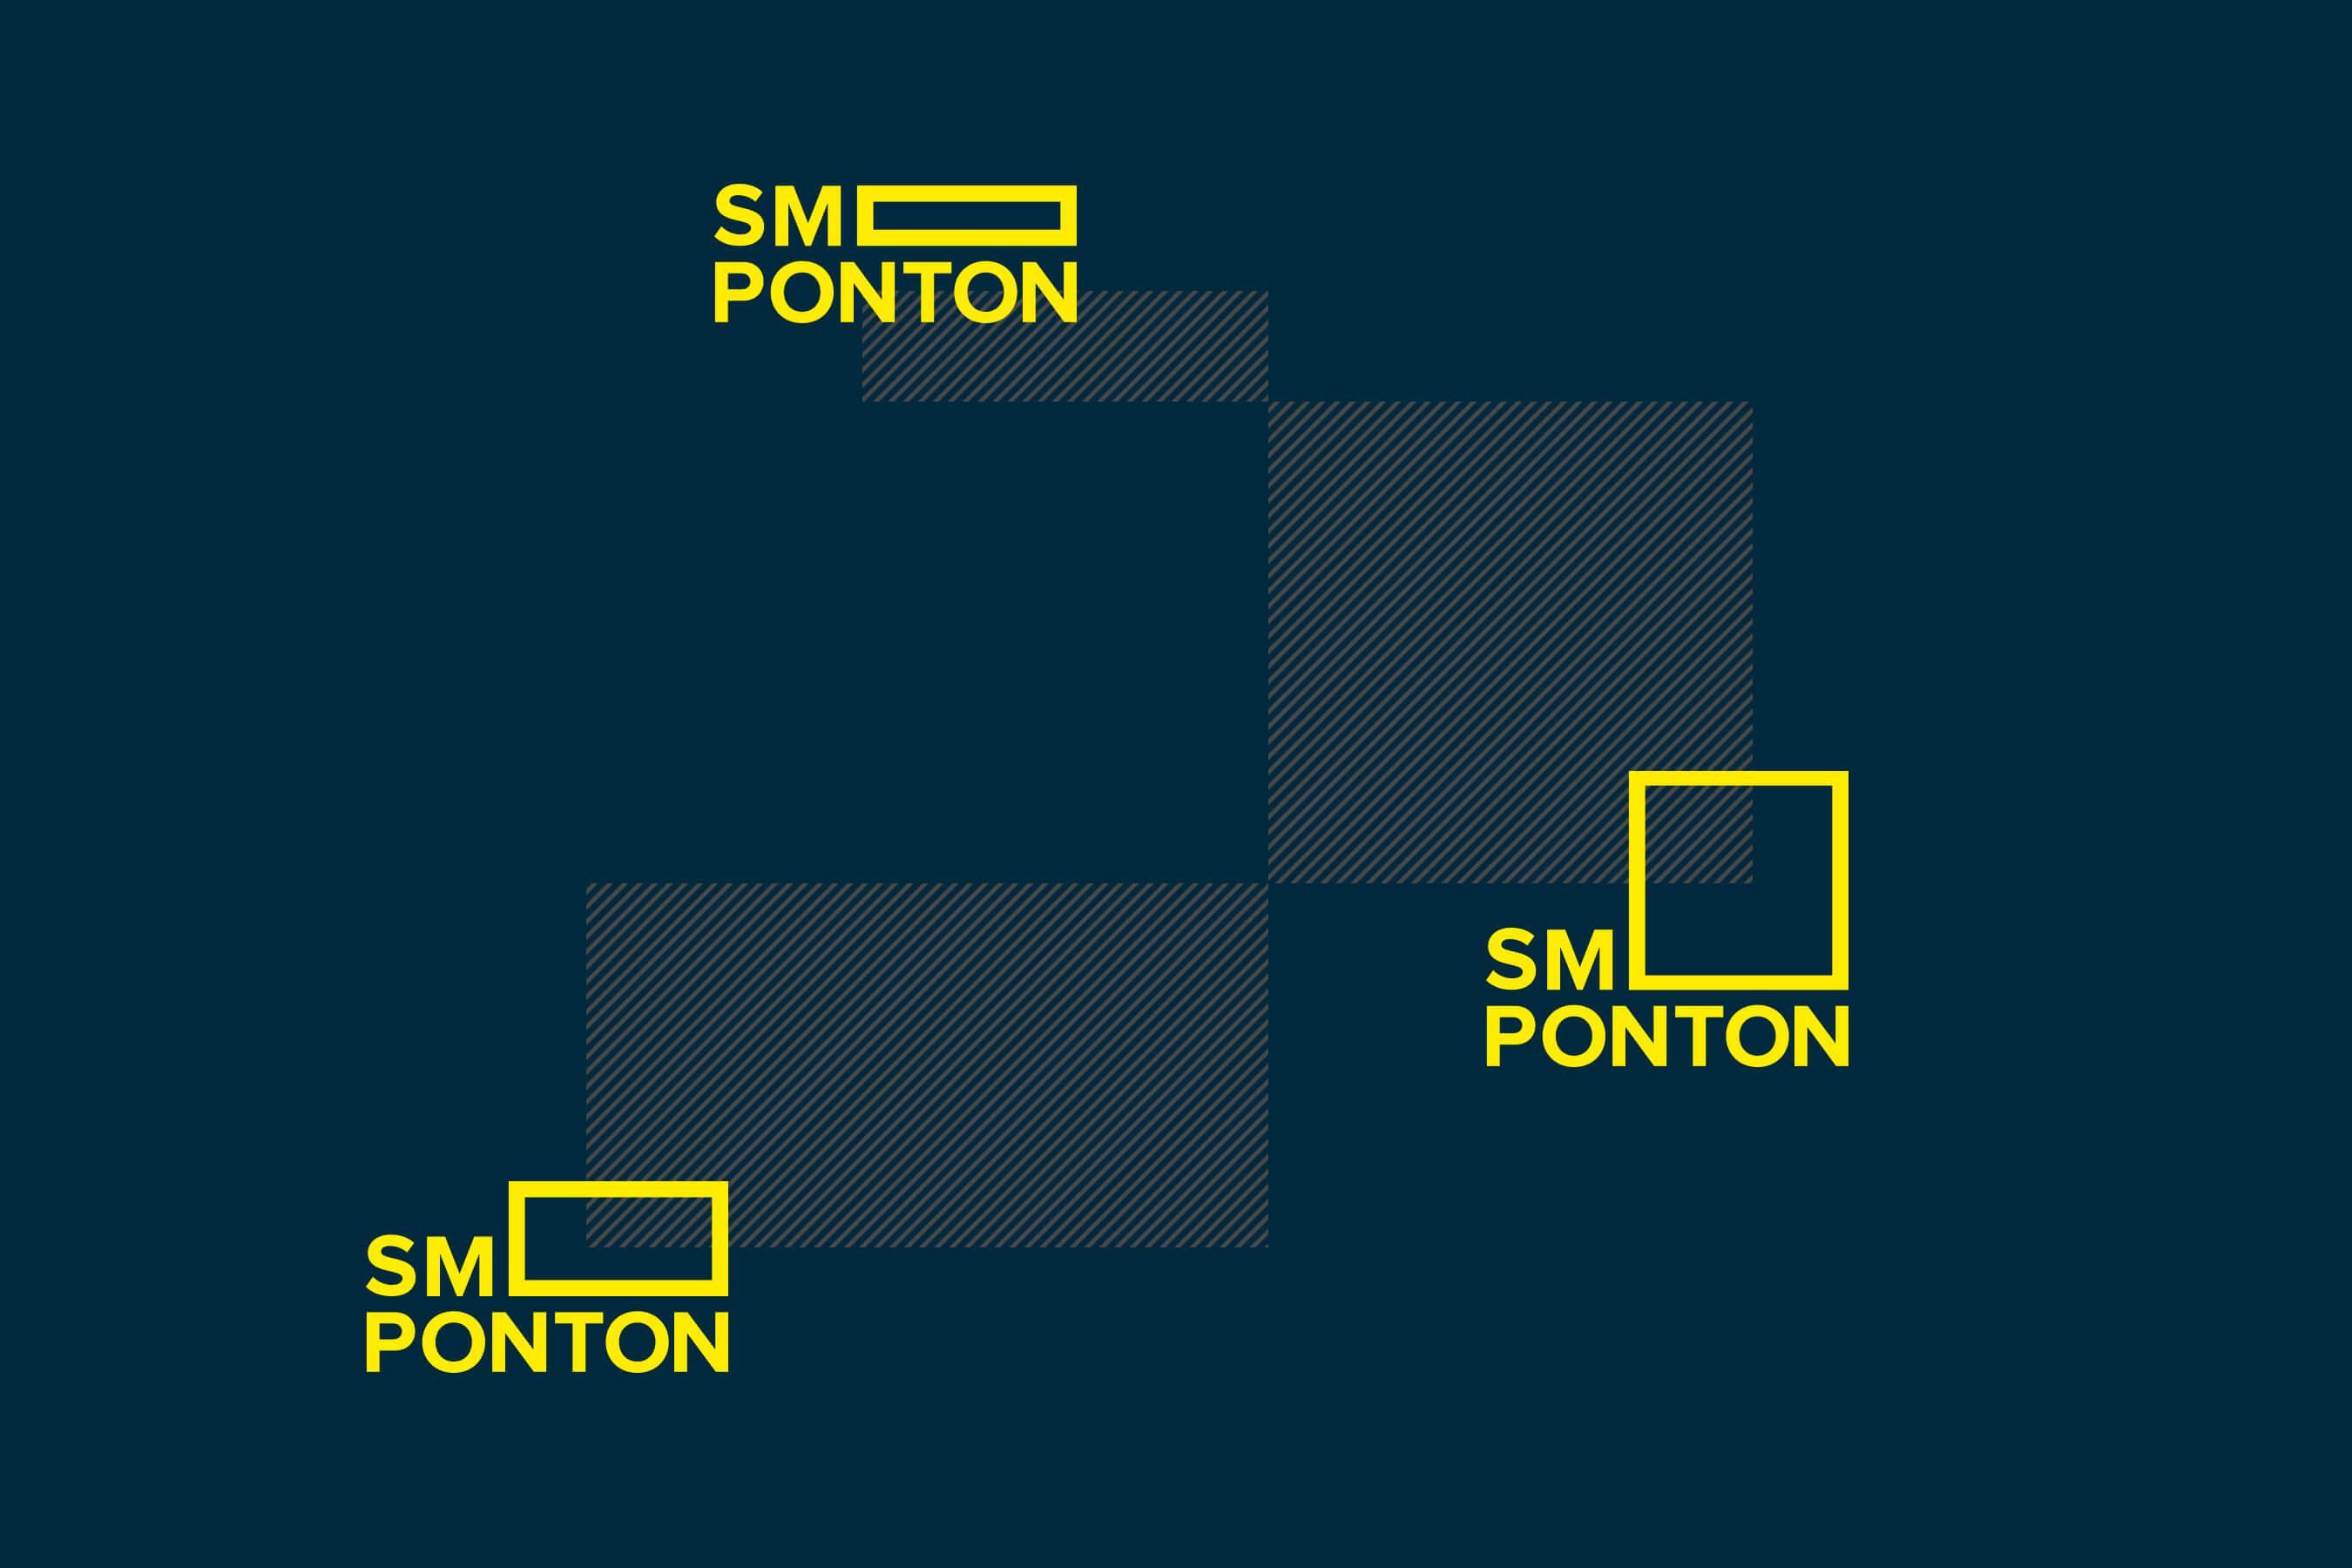 ponton_logos